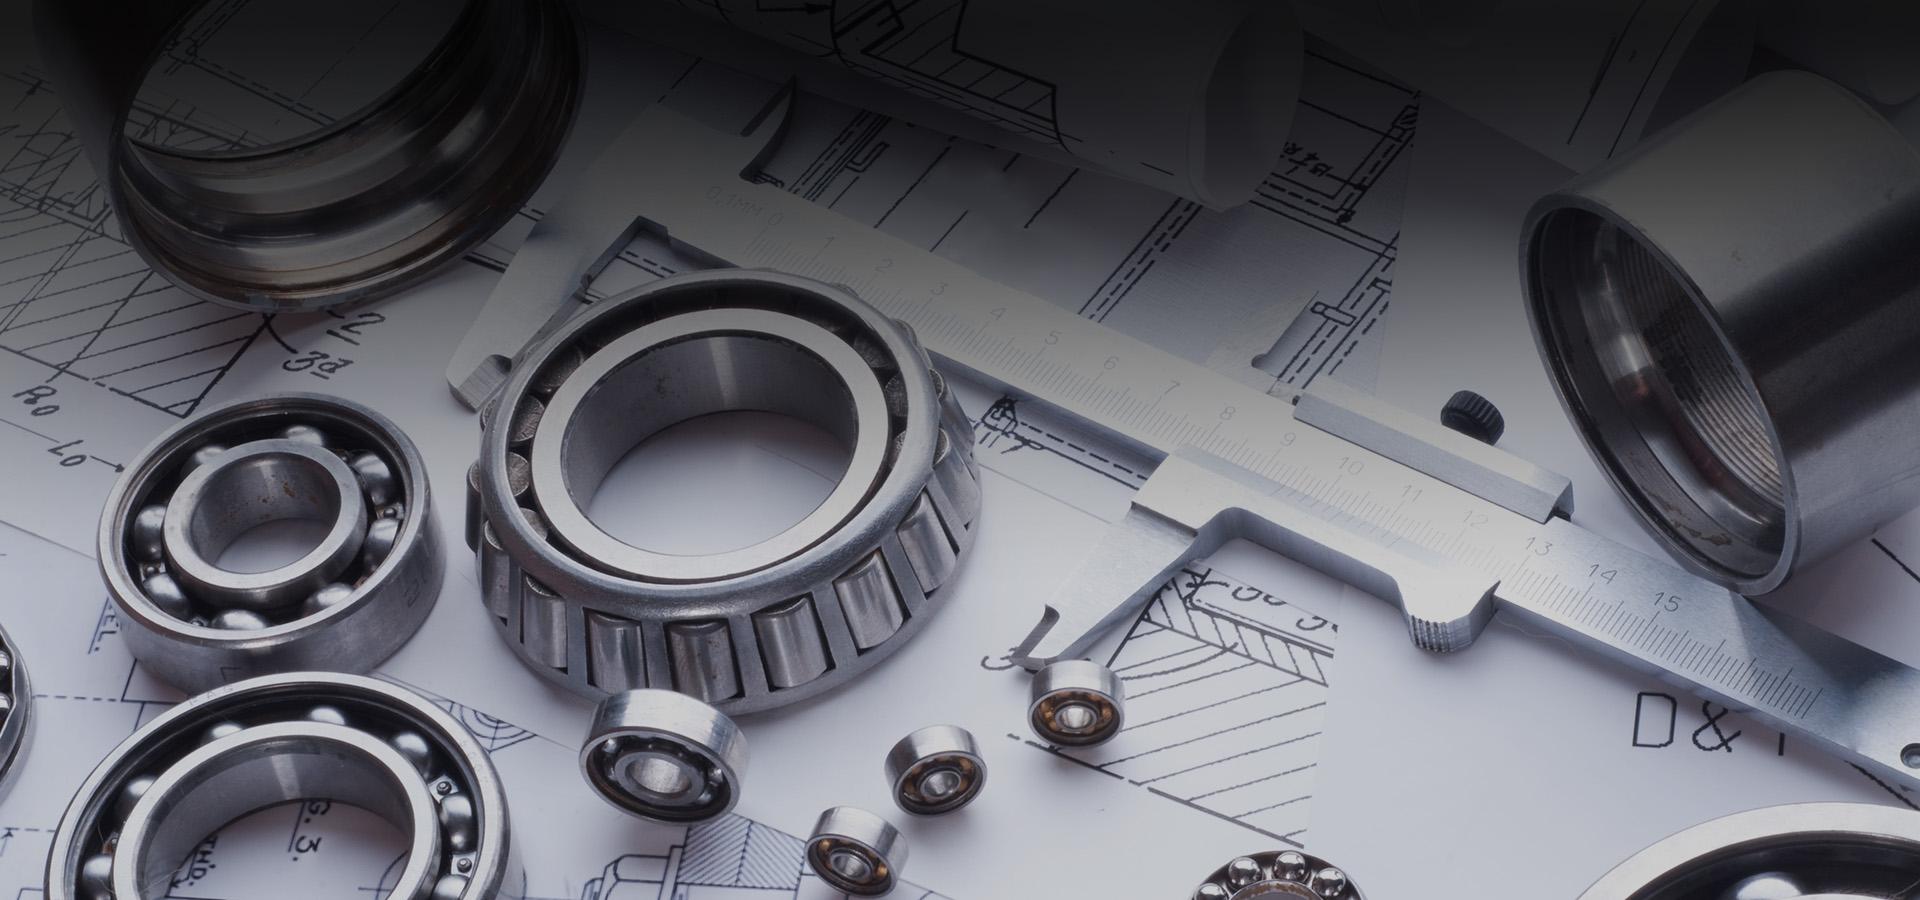 FAG Zylinderrollenlager 35x72x17mm NJ207-E-XL-TVP2-C3 NJ207-E-TVP2-C3